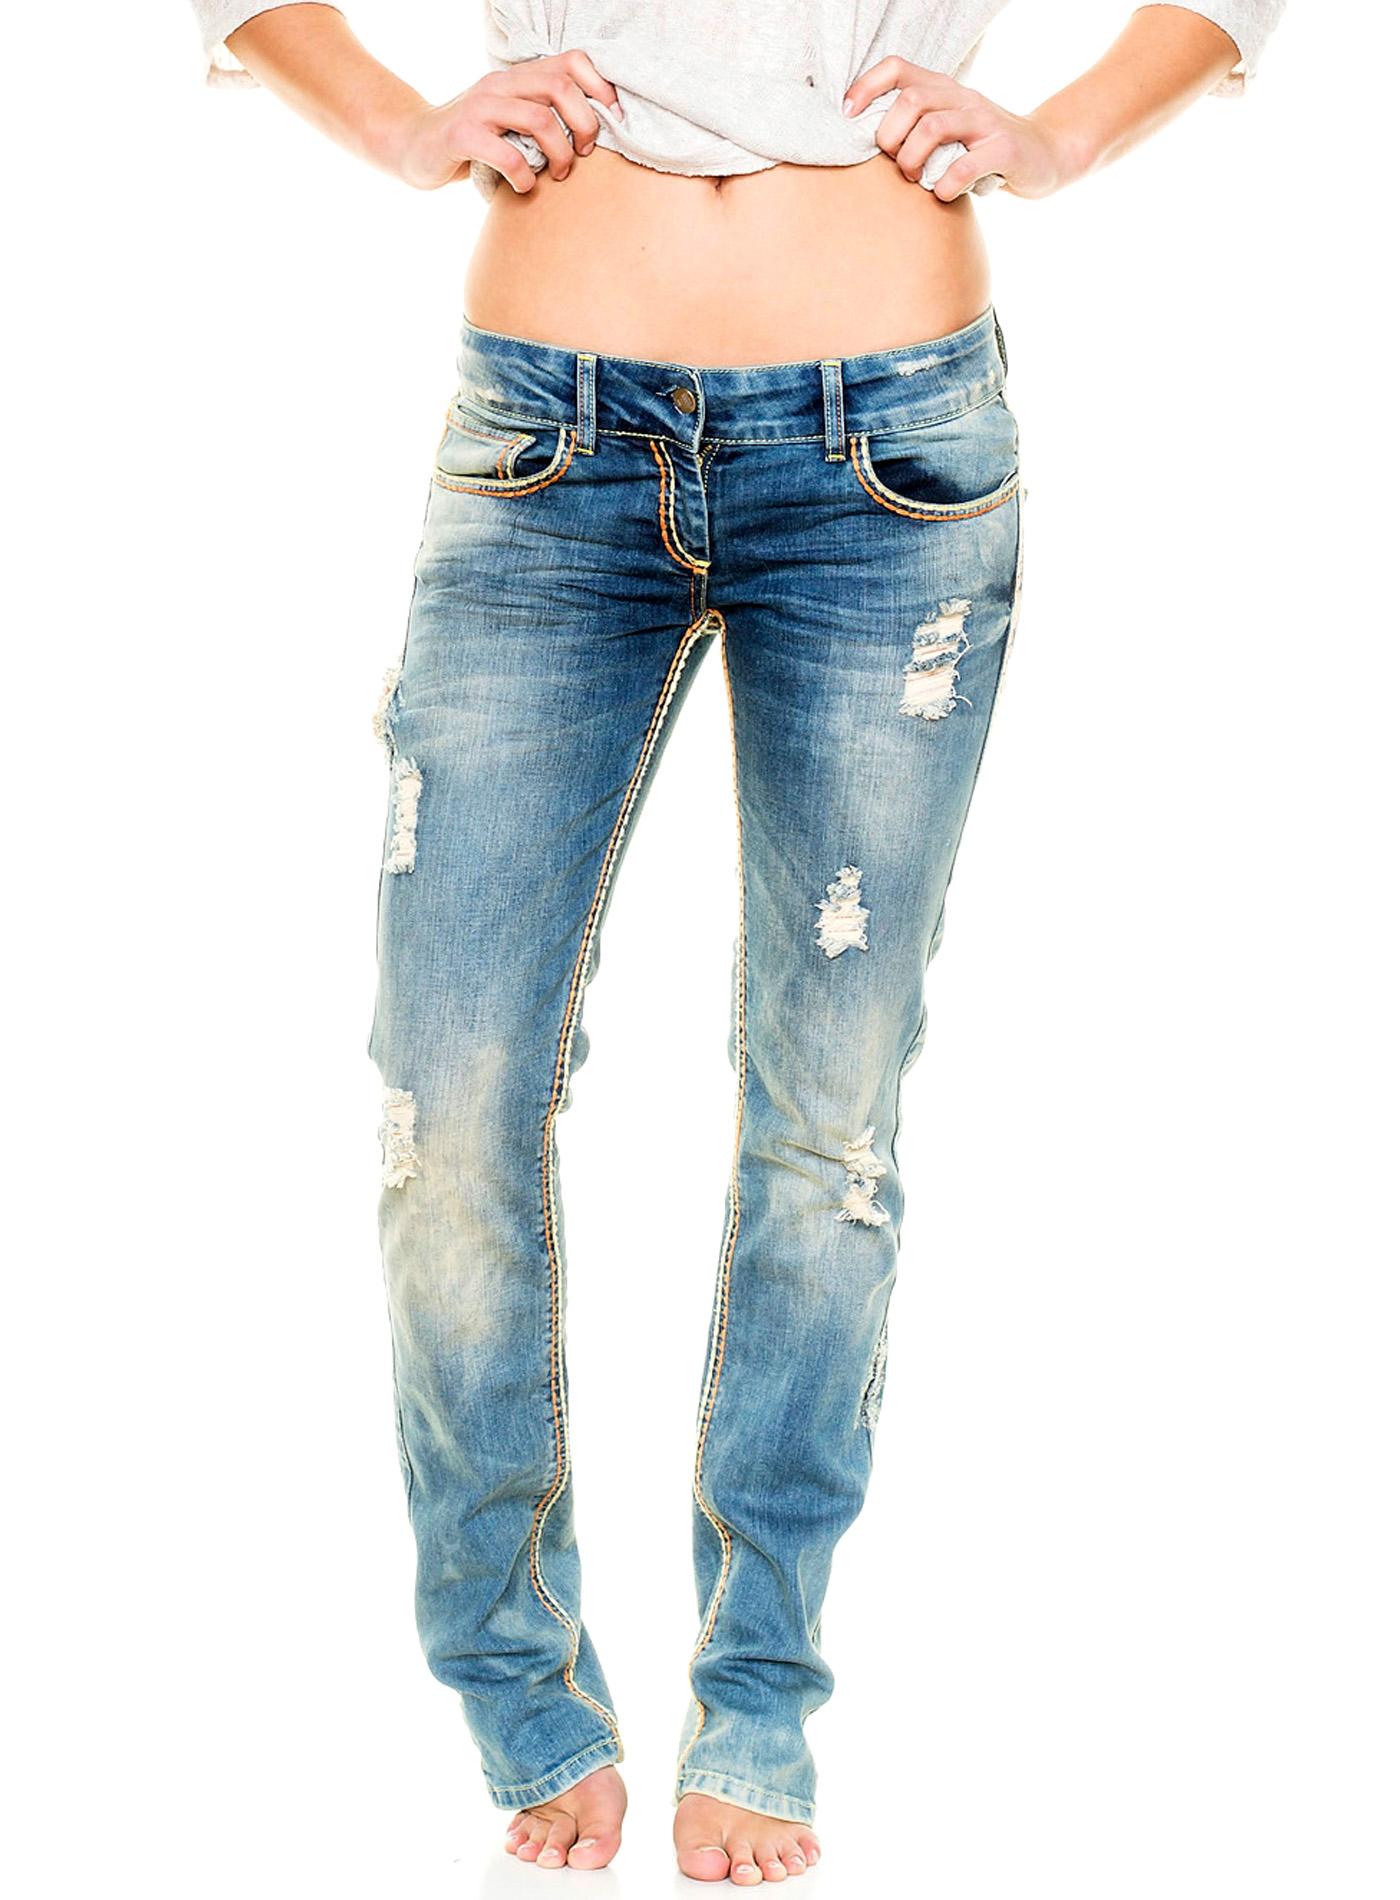 tazzio damen jeans hose straight low waist vintage look. Black Bedroom Furniture Sets. Home Design Ideas